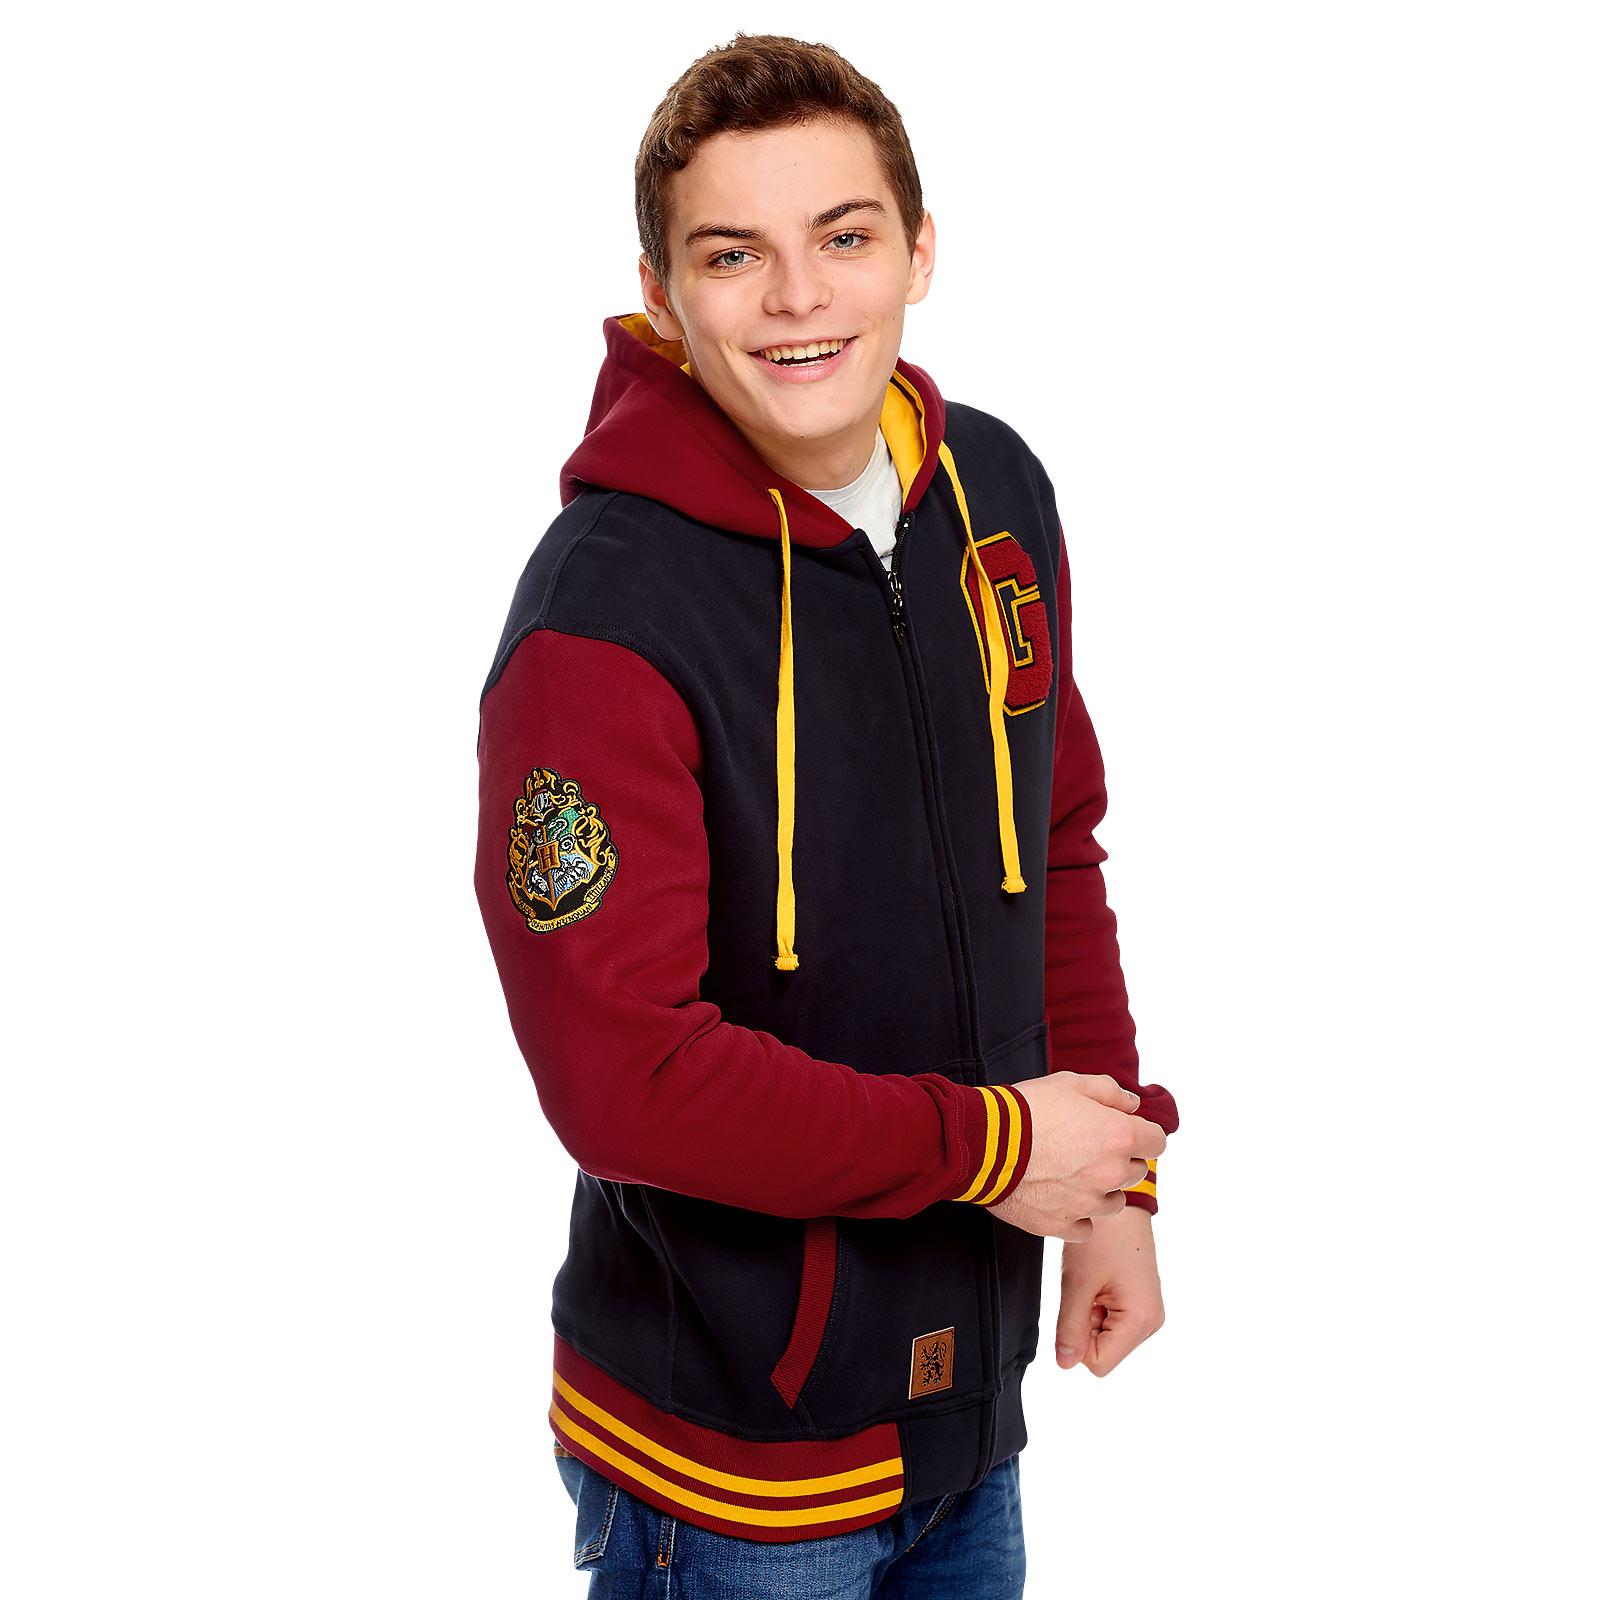 Harry Potter - Proud Gryffindor Kapuzenjacke